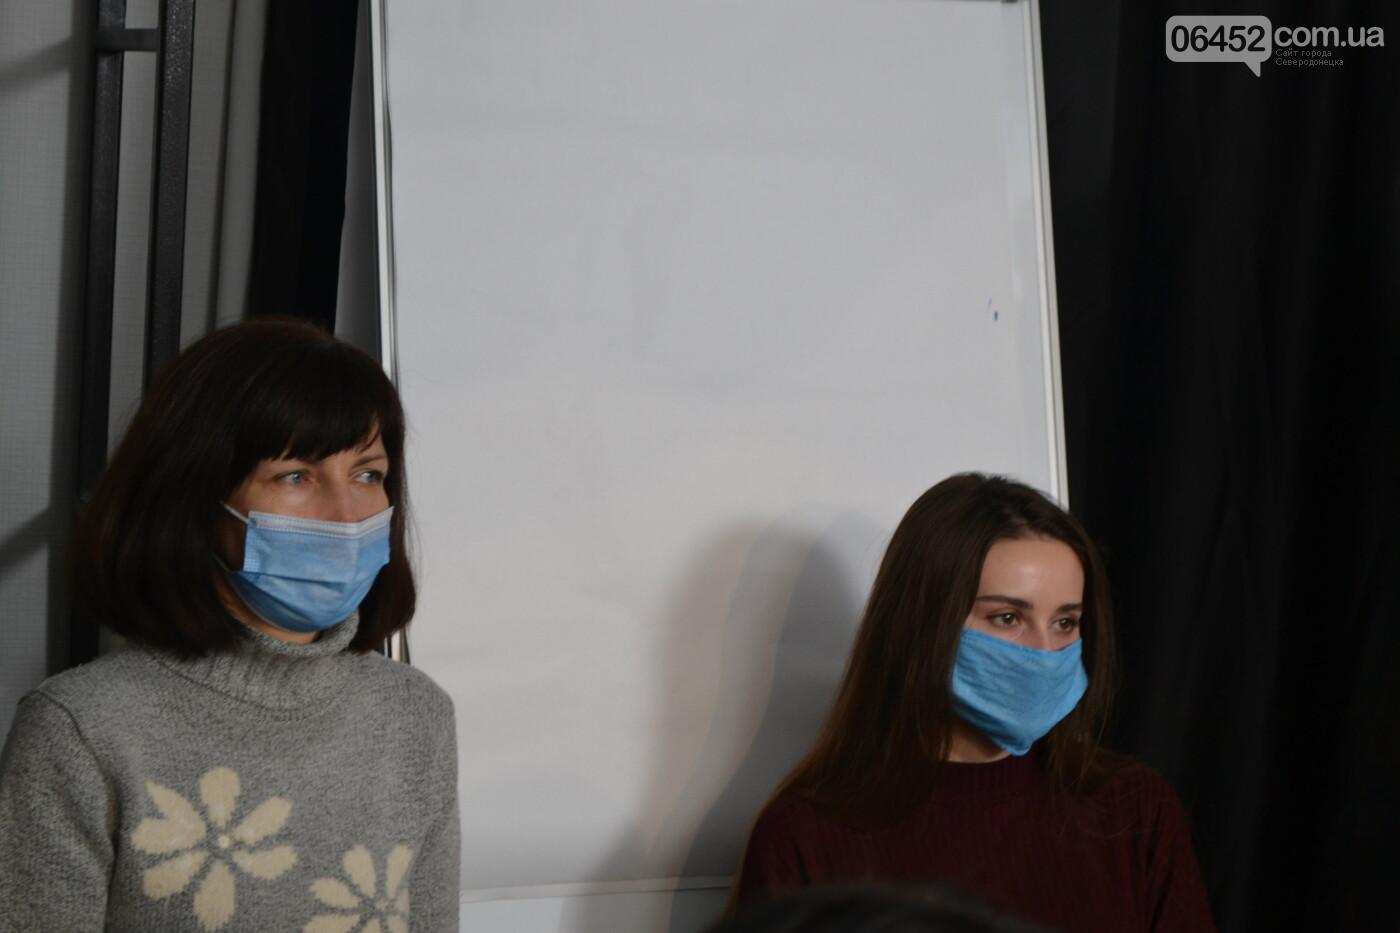 Северодончанам презентовали запрещенную книгу о Стусе , фото-6